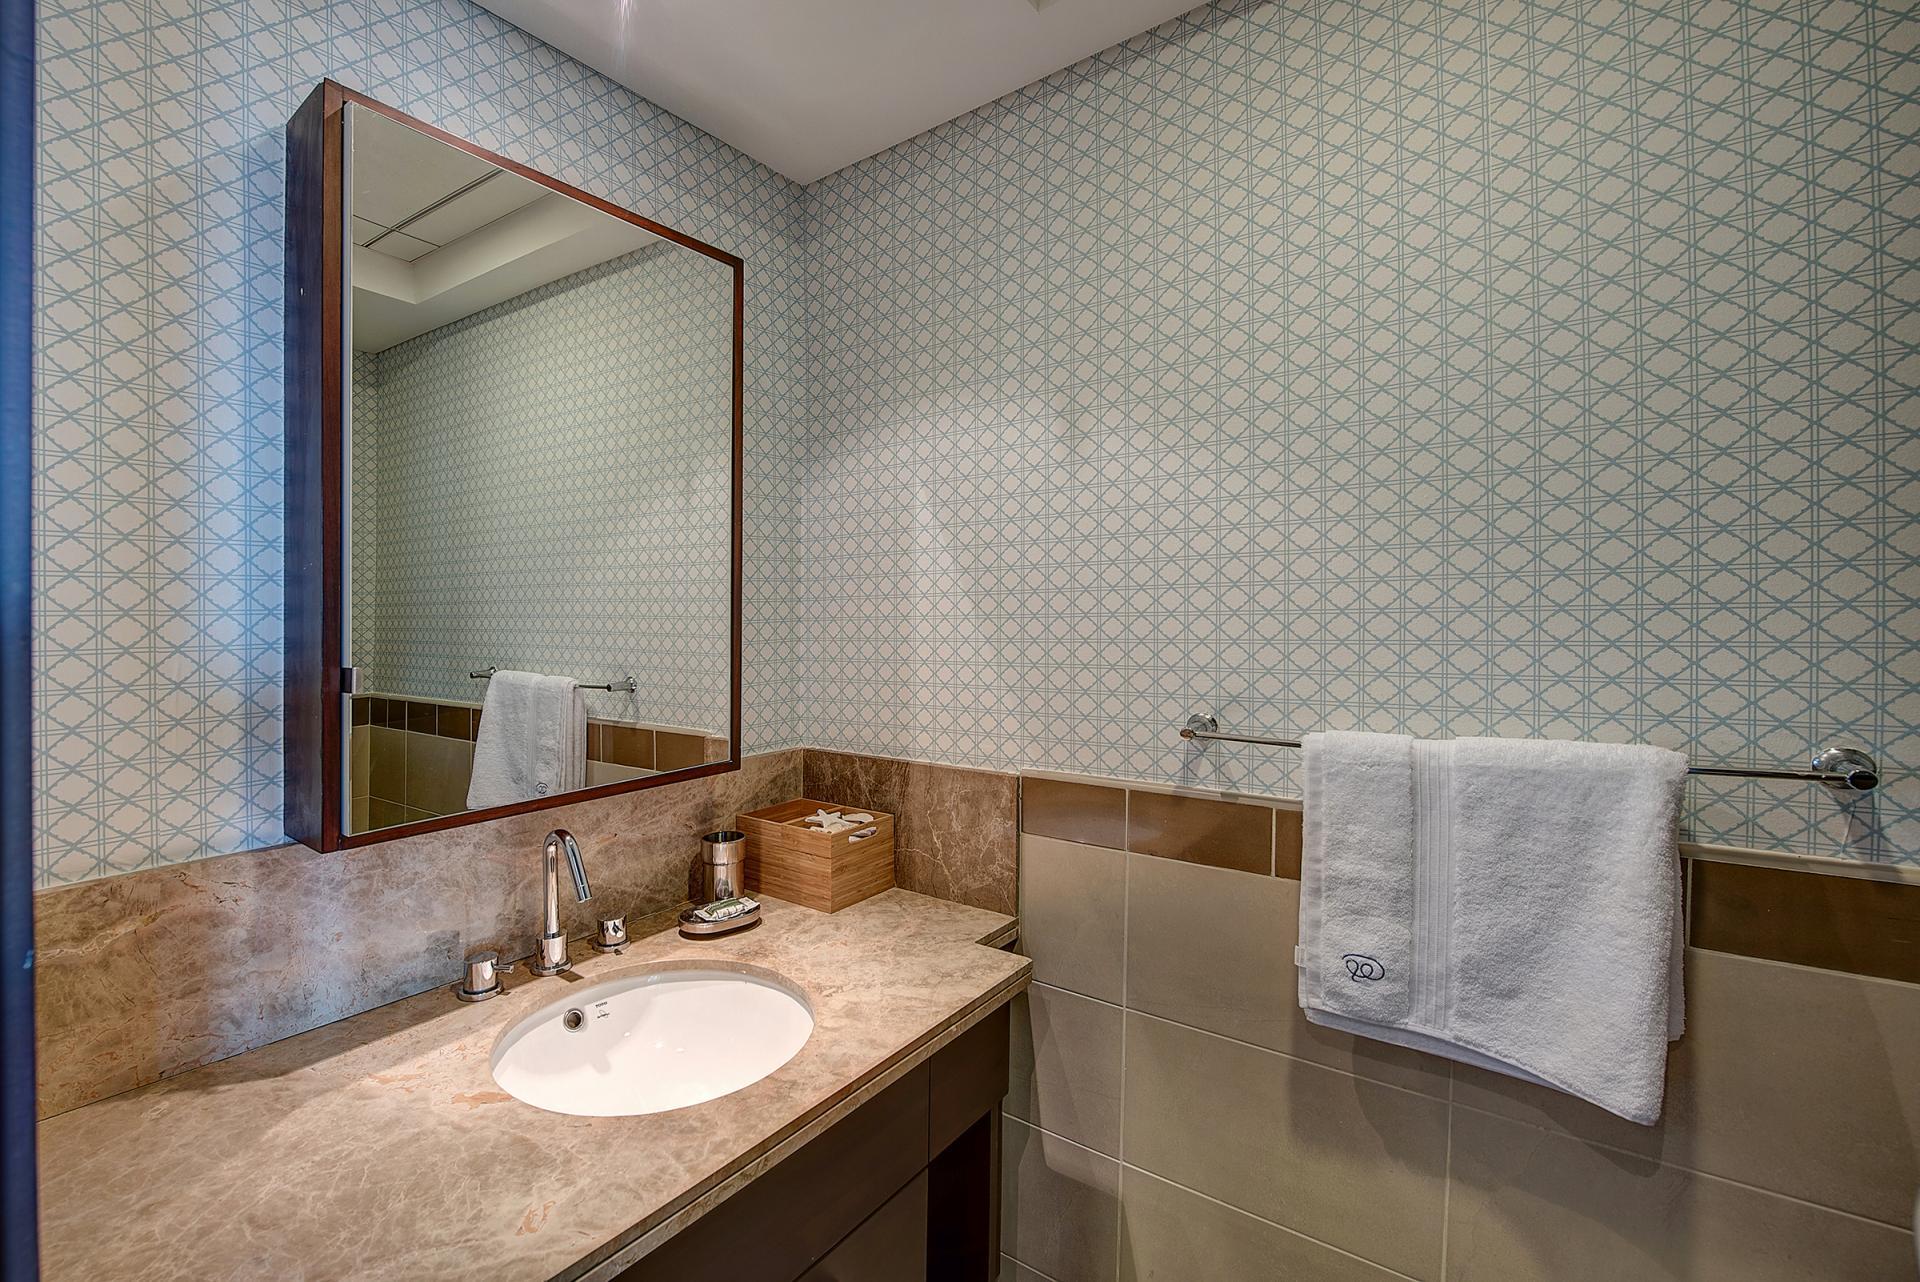 Bathroom vanity at DIFC Index Tower Apartment